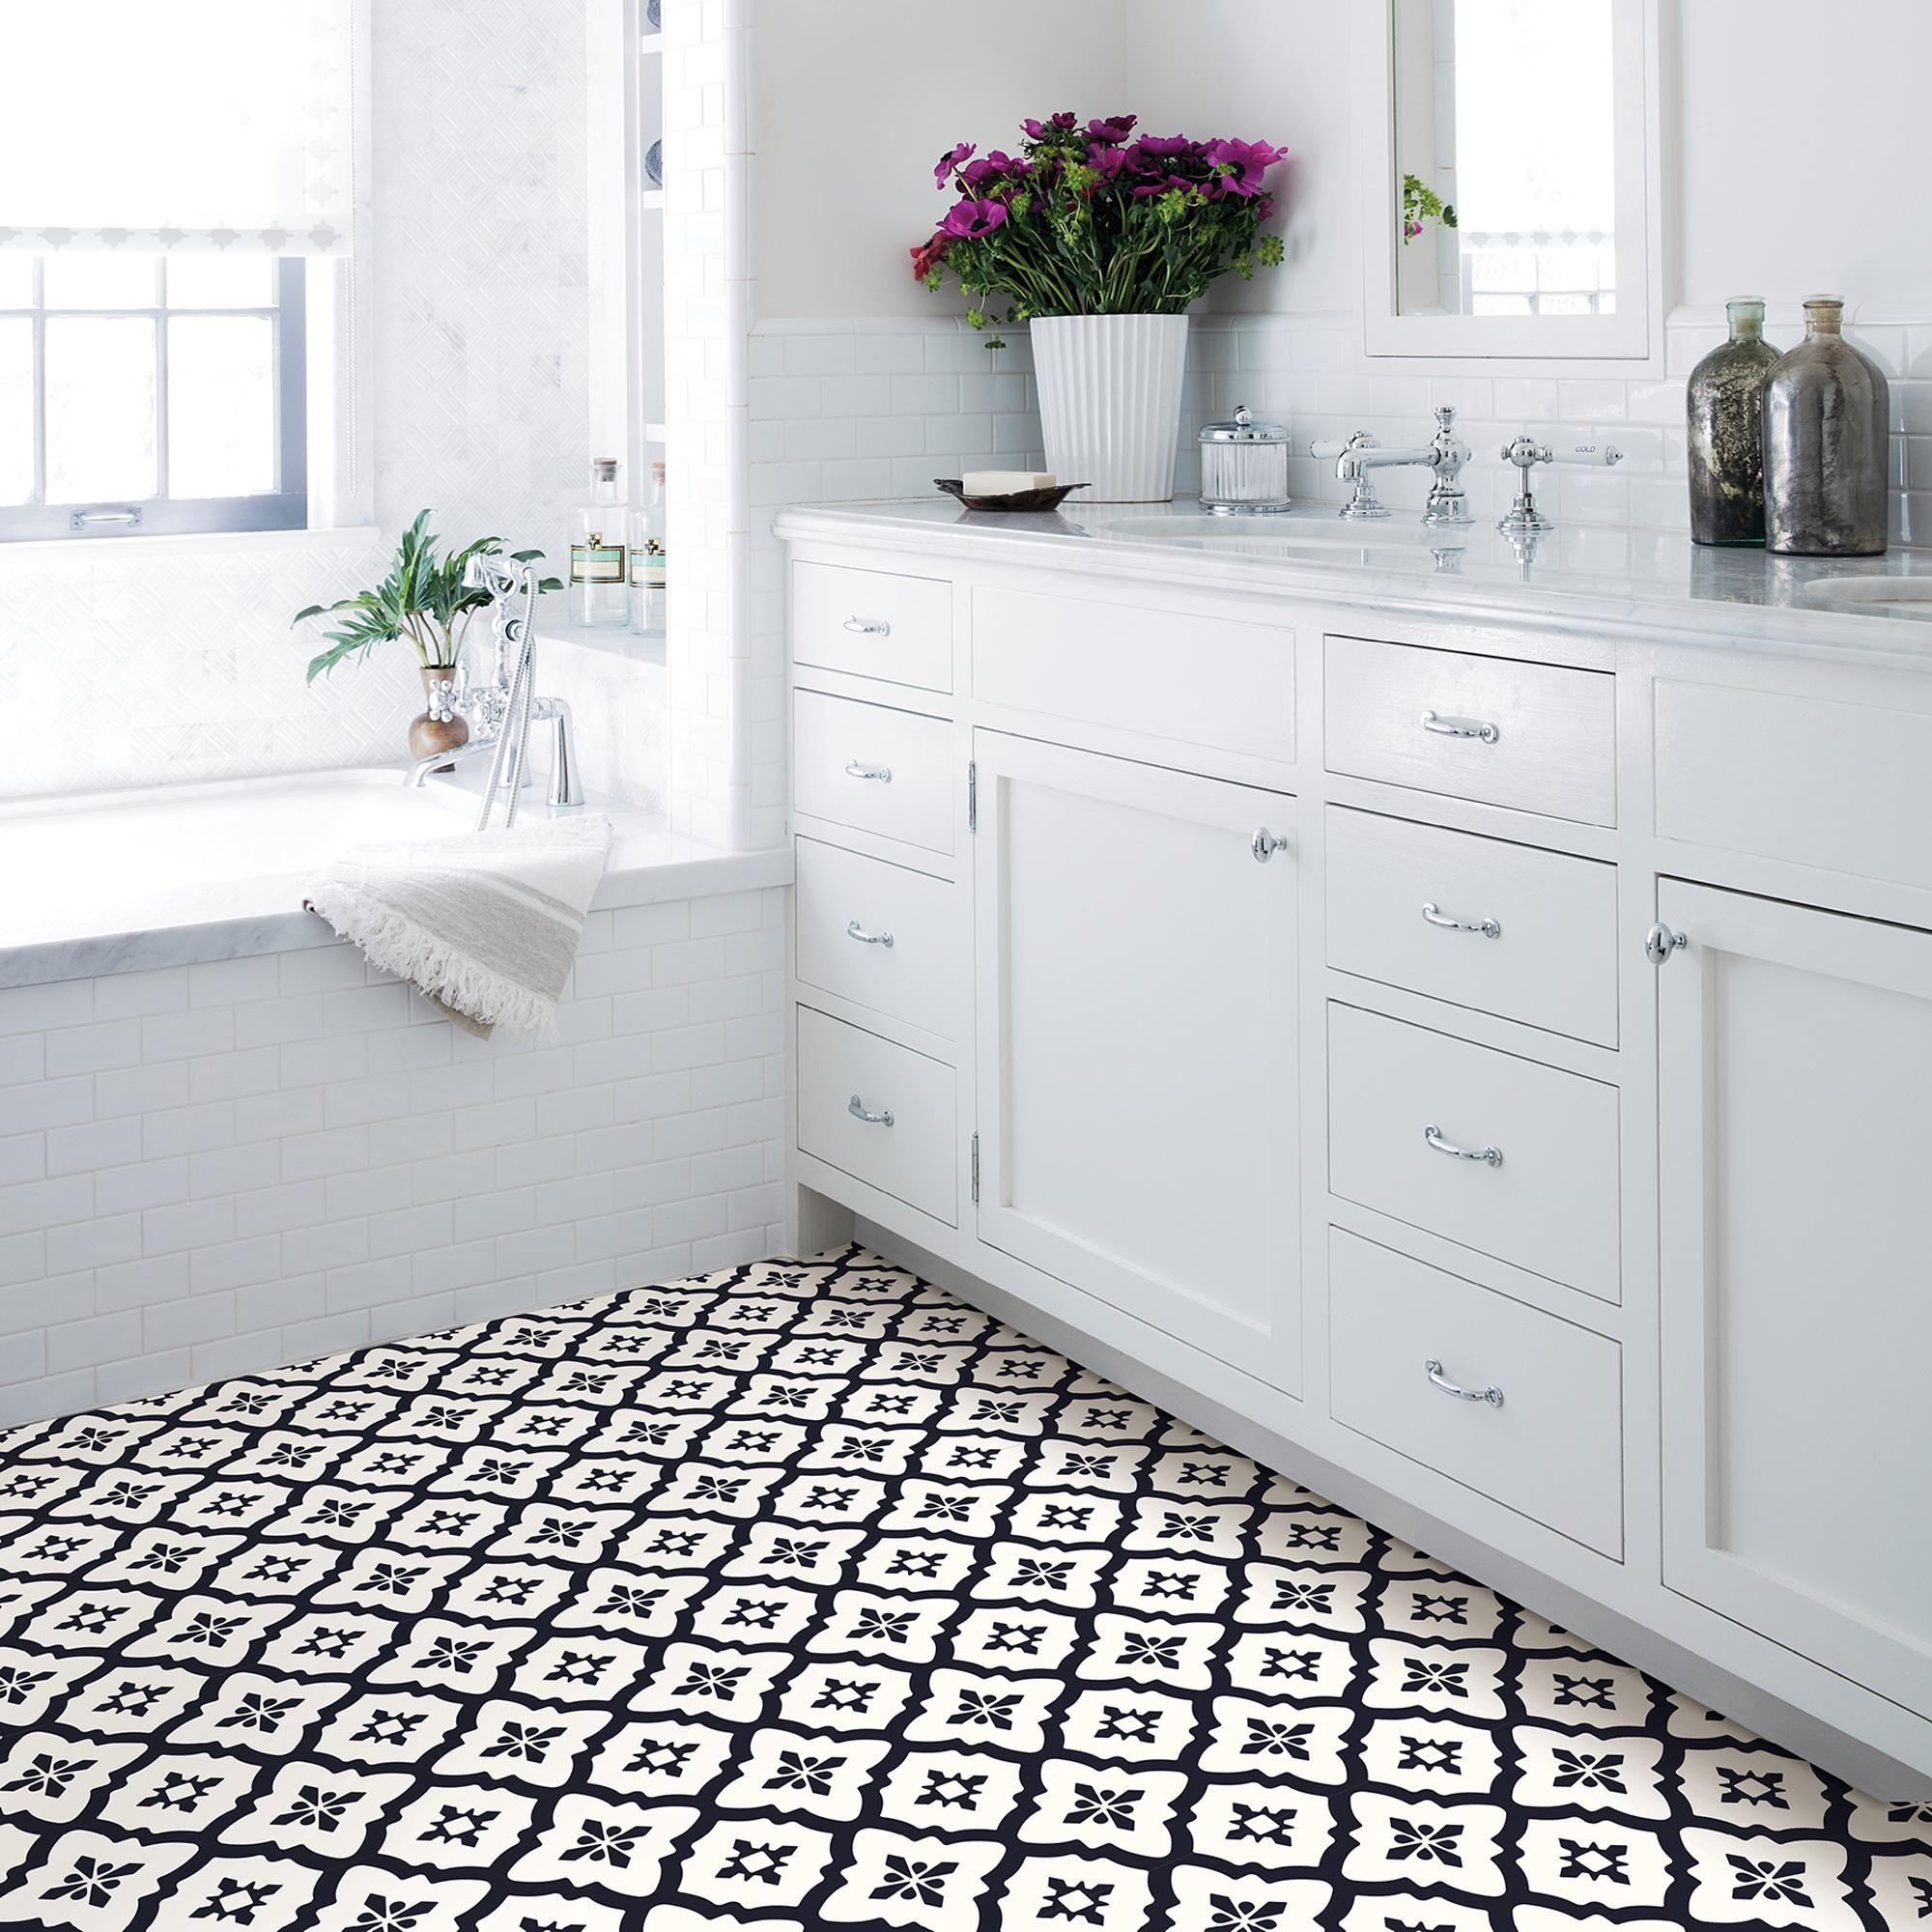 Pin On Black And White Bathroom Floor Tiles